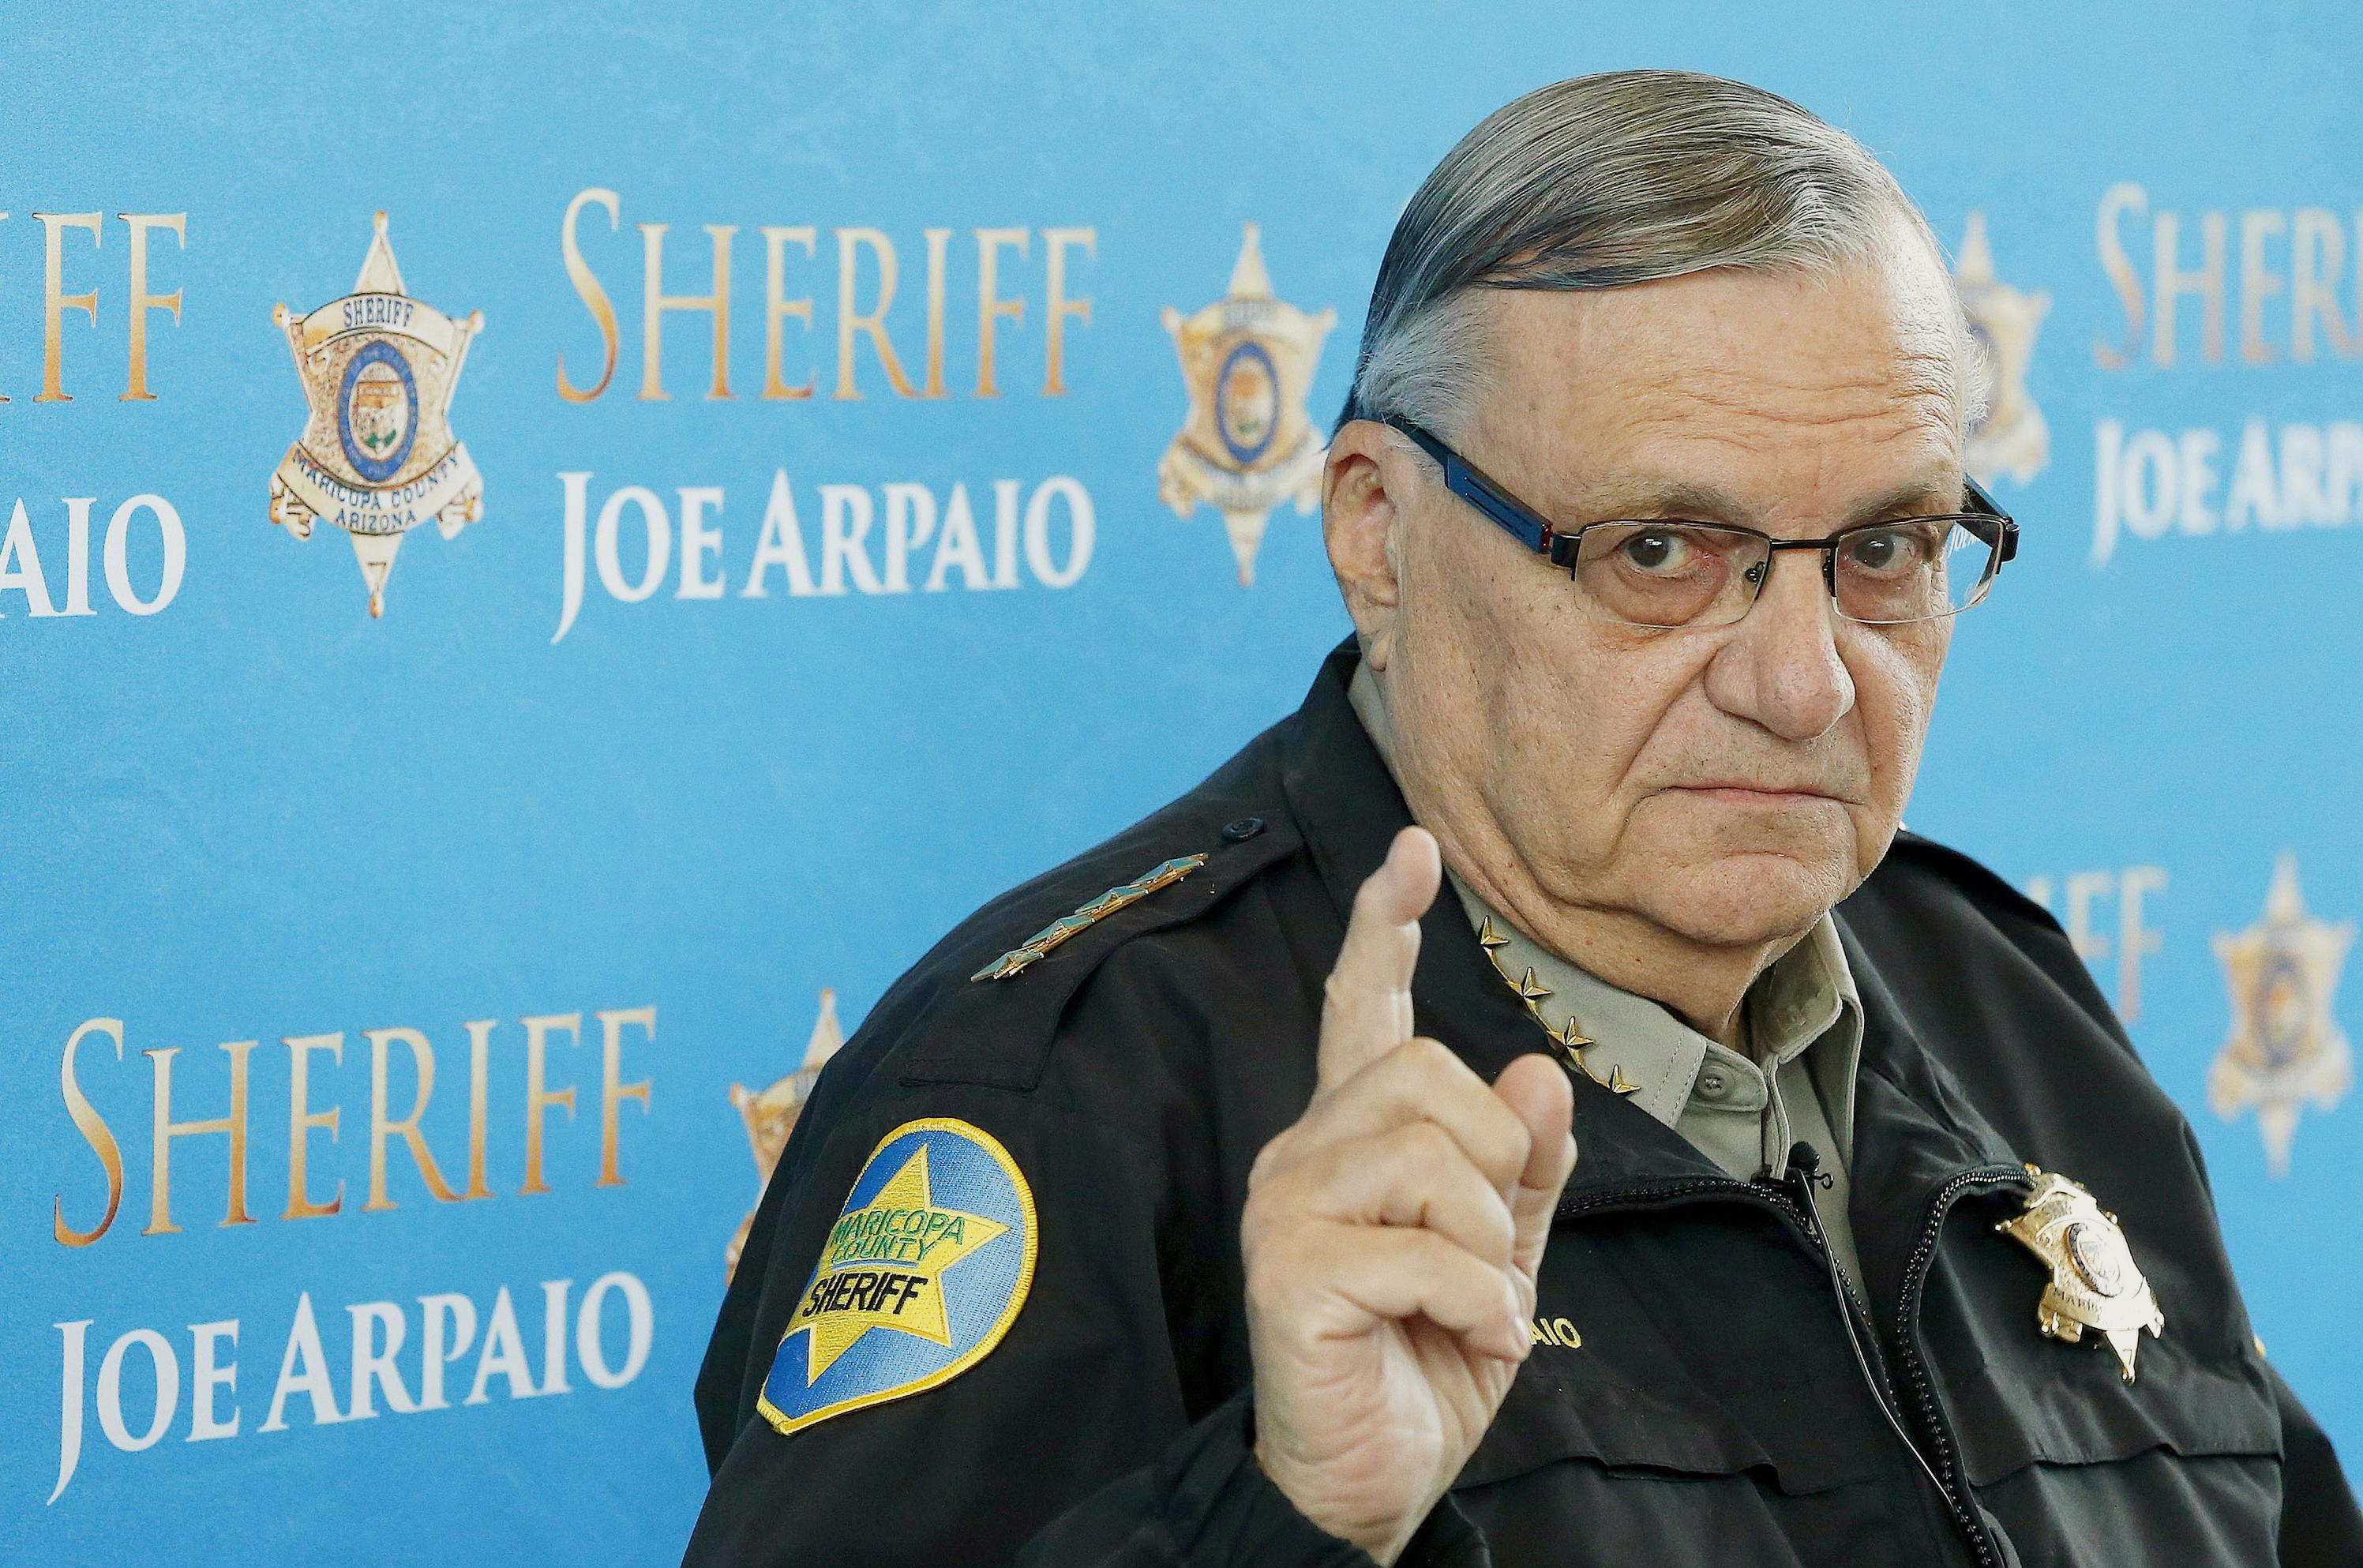 Sheriff Joe Arpaio Dives Into Obama Birth Certificate Again The